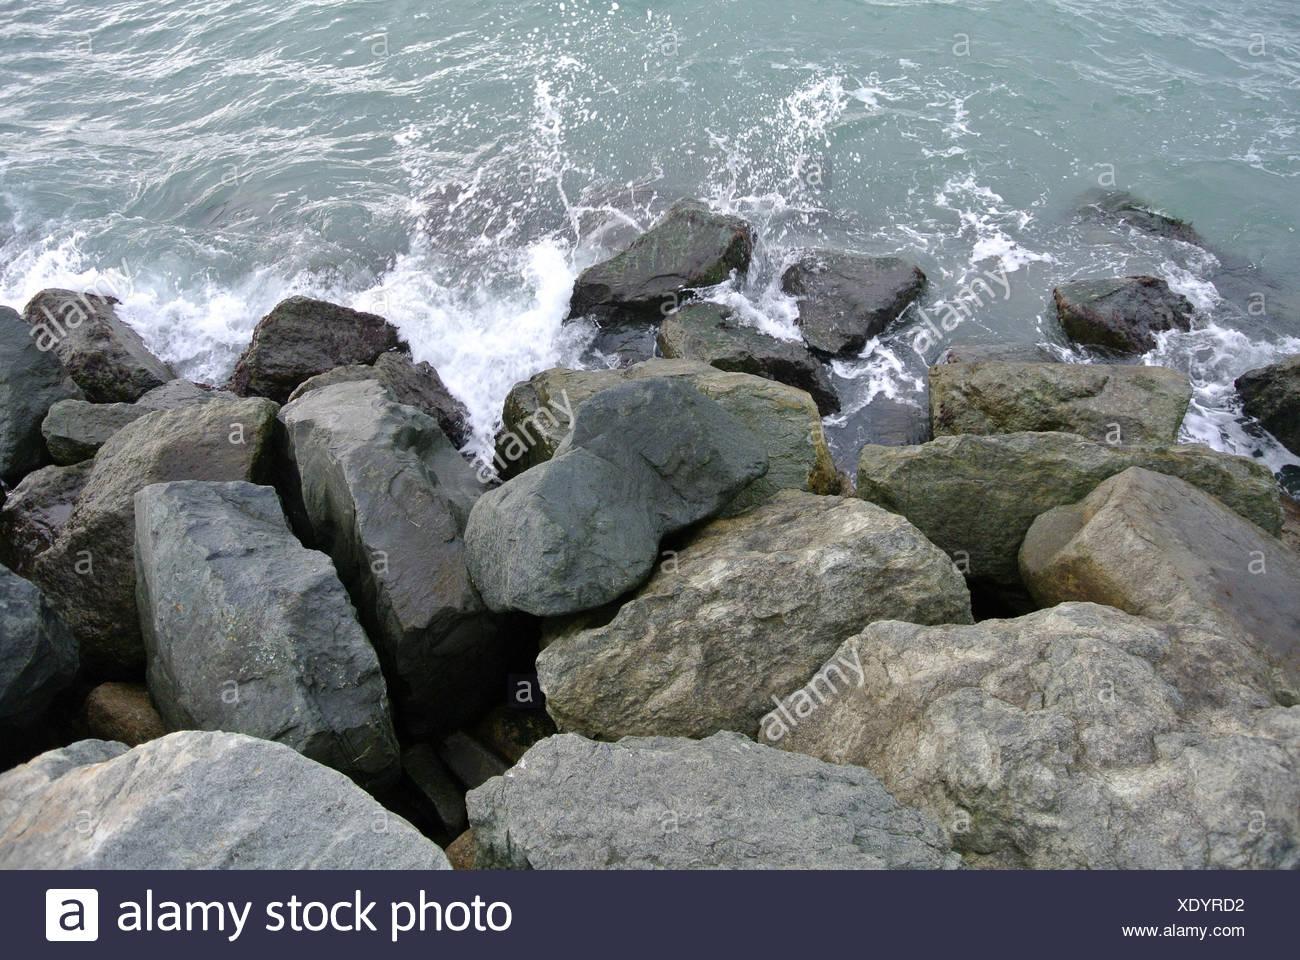 Sea Waves Smashing Against Boulders - Stock Image